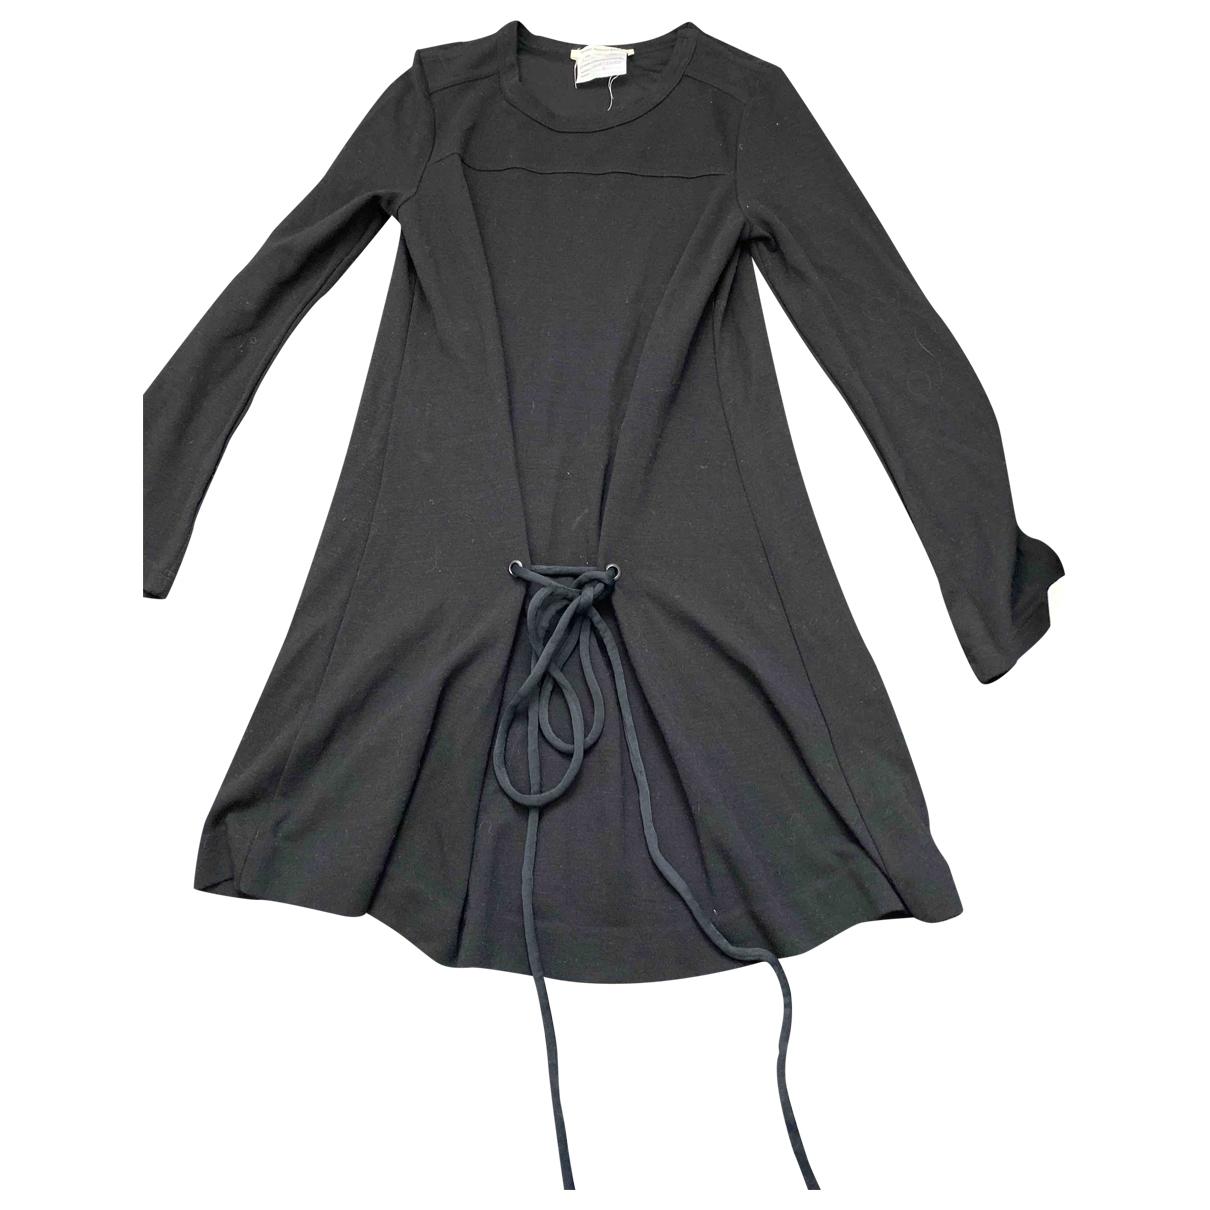 Isabel Marant \N Kleid in  Schwarz Polyester